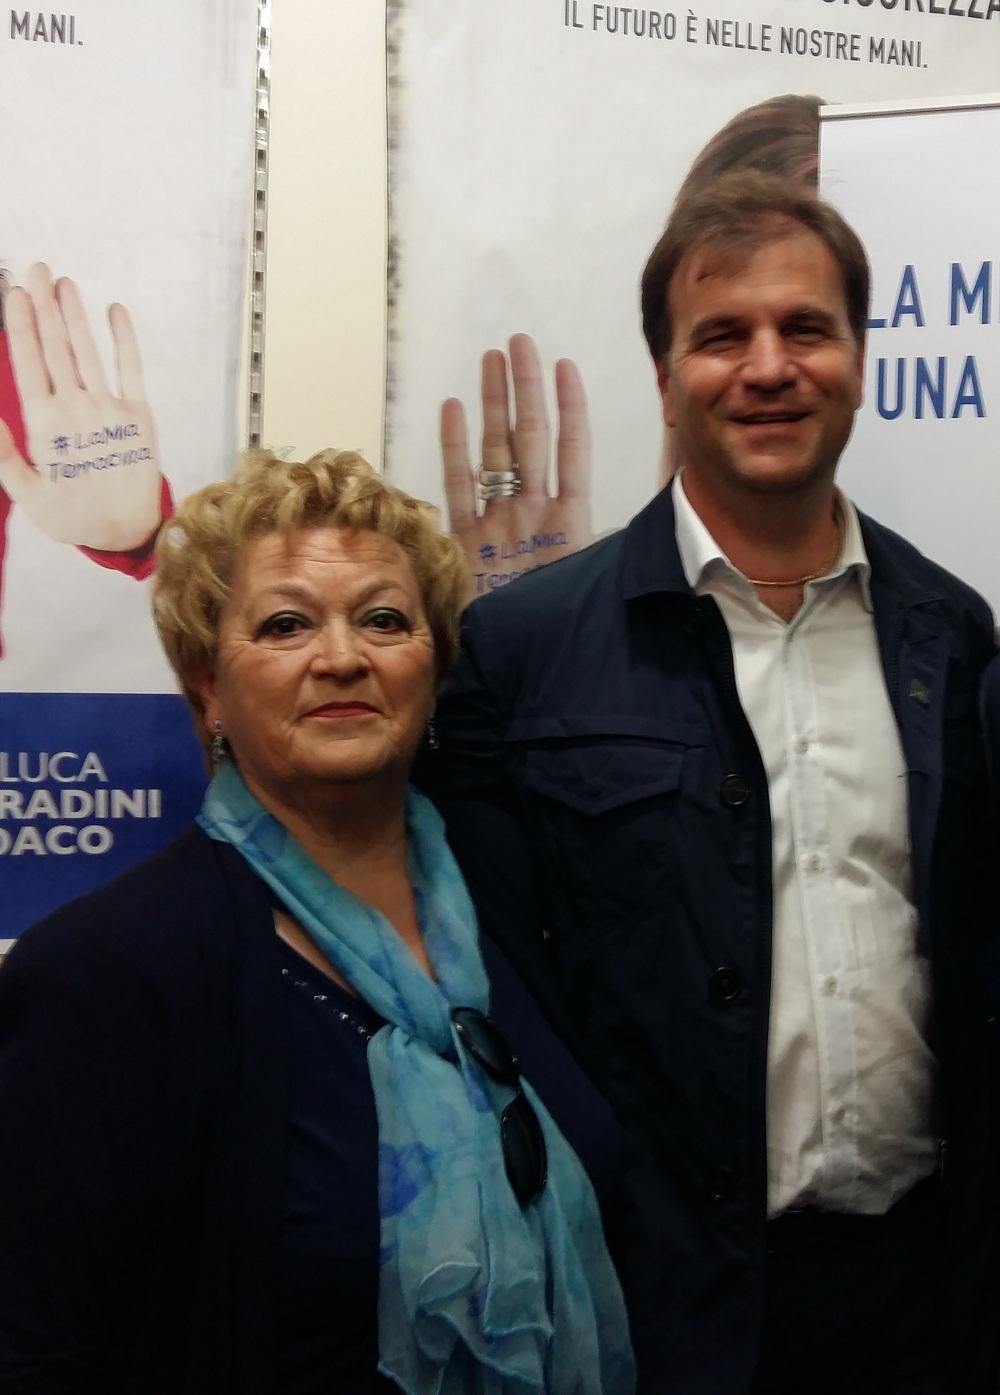 Augusta Nardoni e Gianluca Corradini